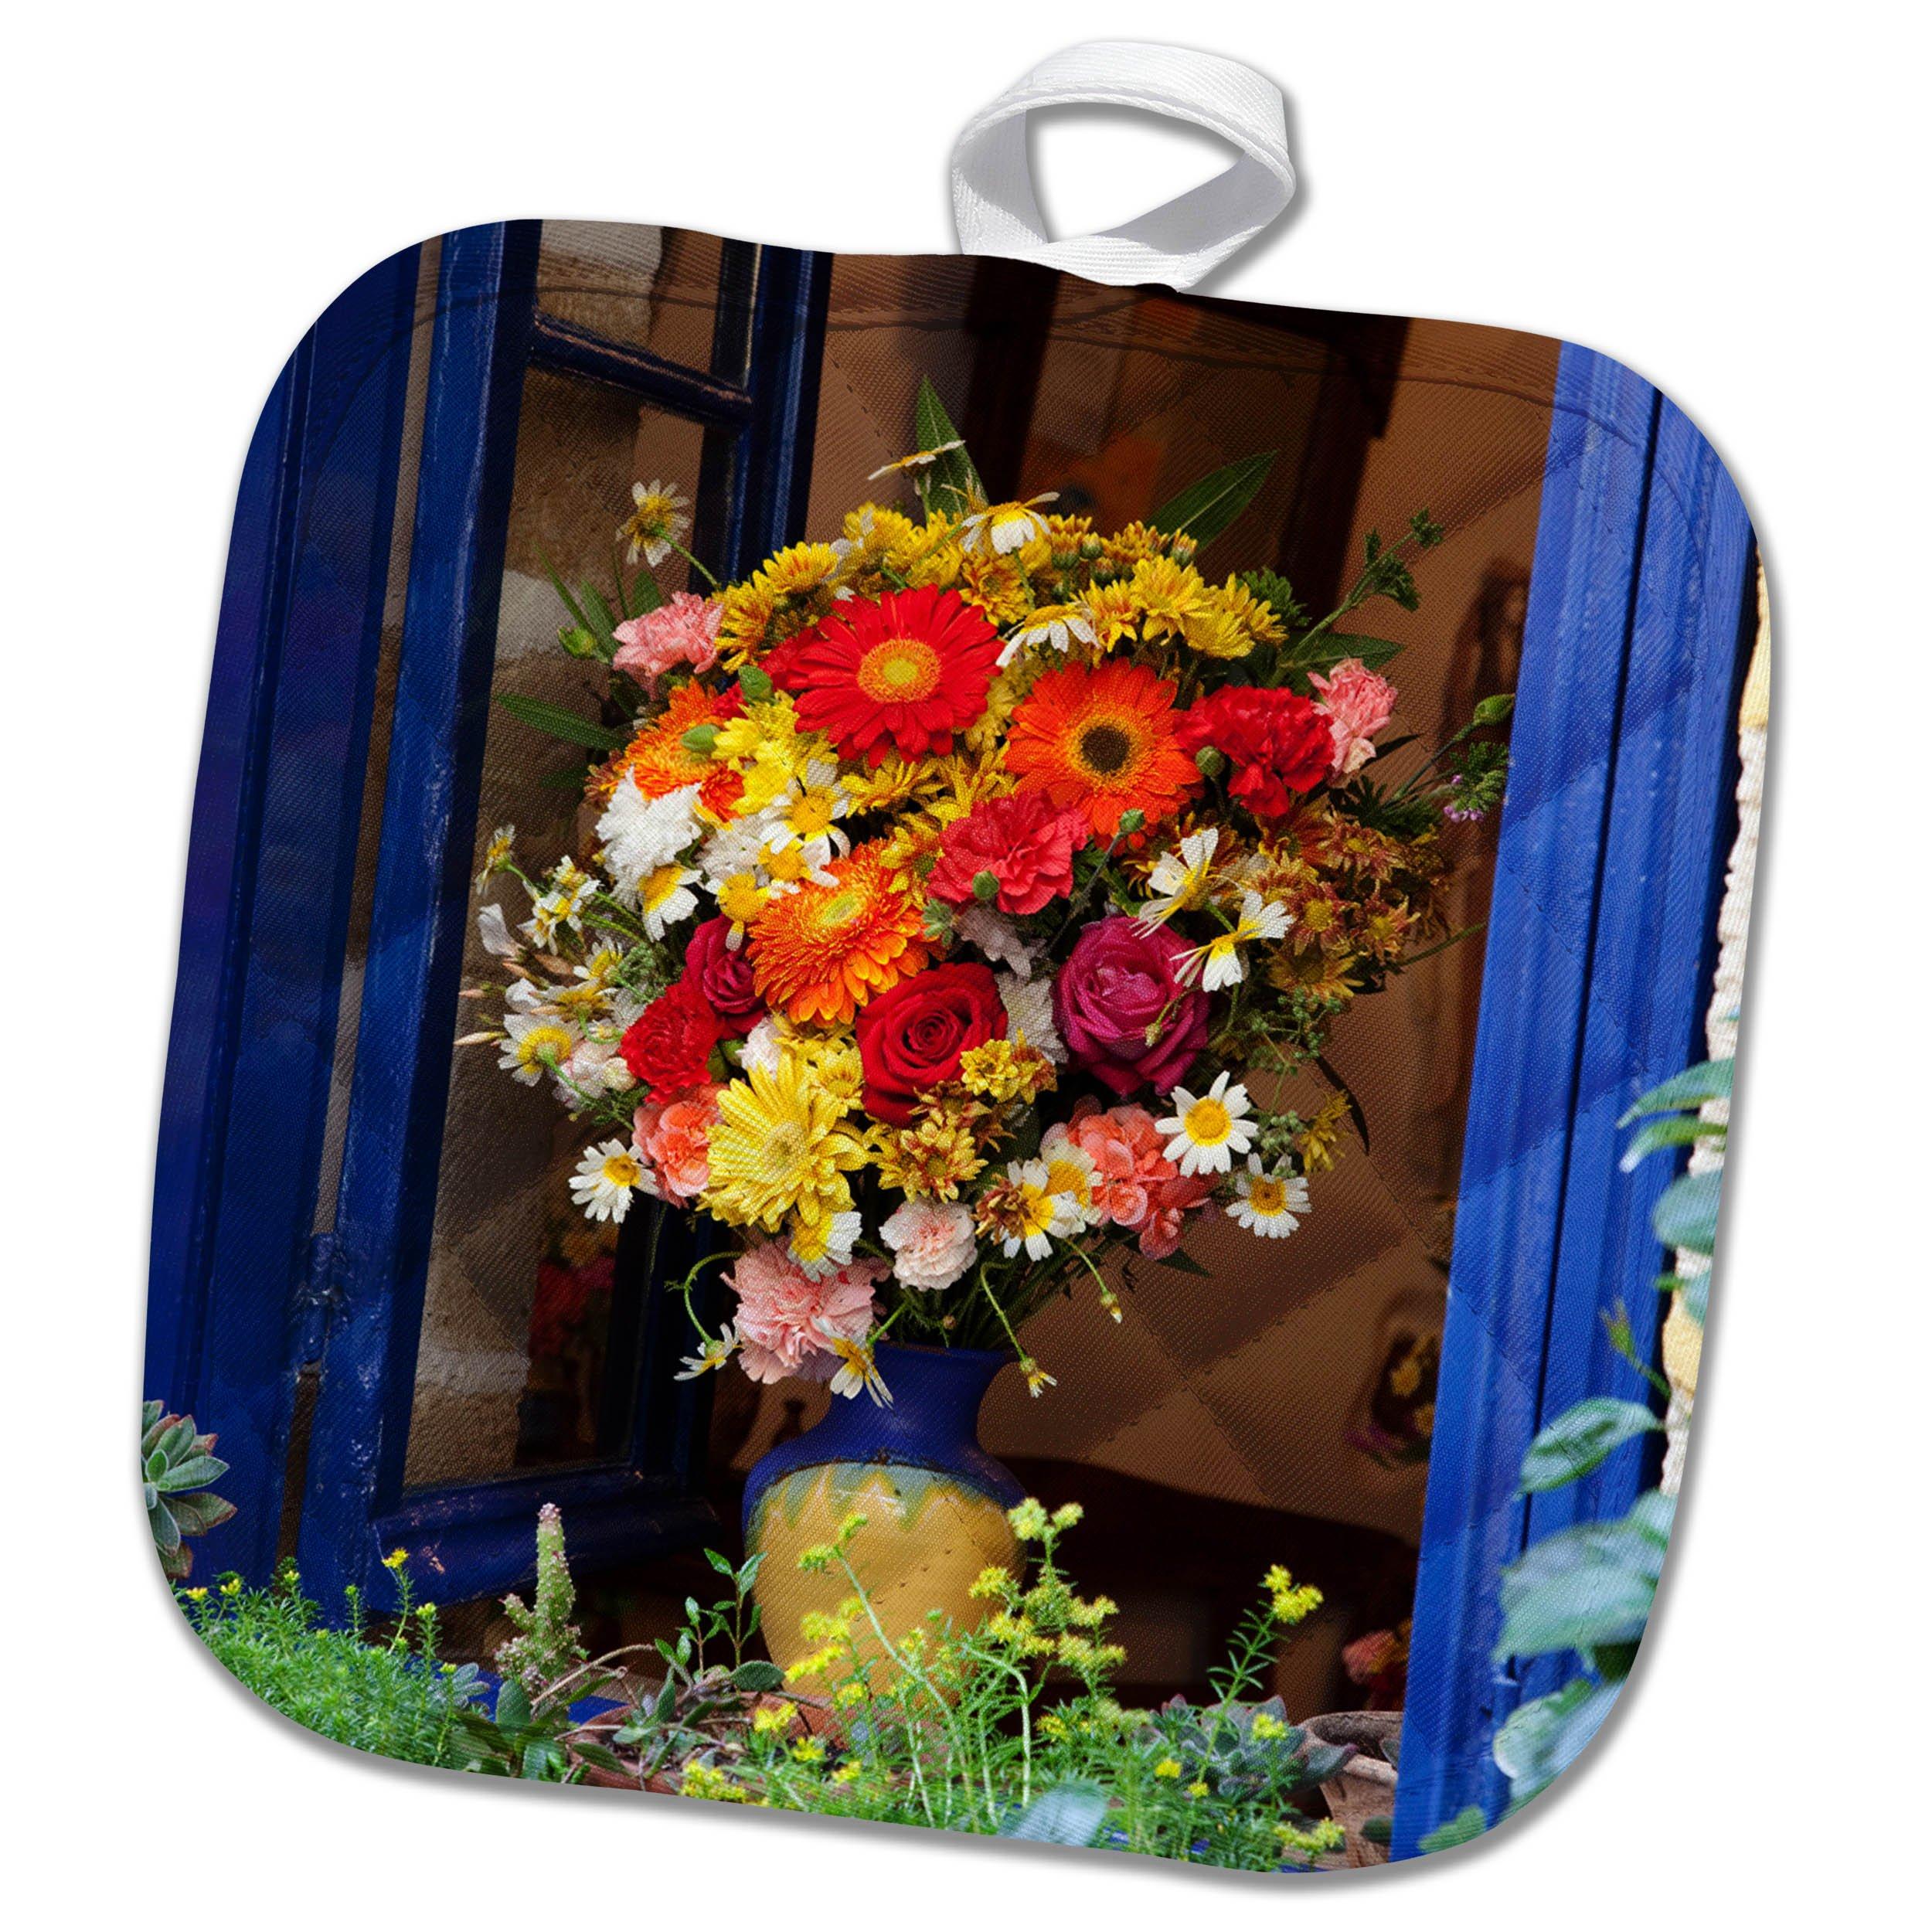 3dRose Danita Delimont - Flowers - Greece, Crete, Window with flowers - 8x8 Potholder (phl_277435_1)